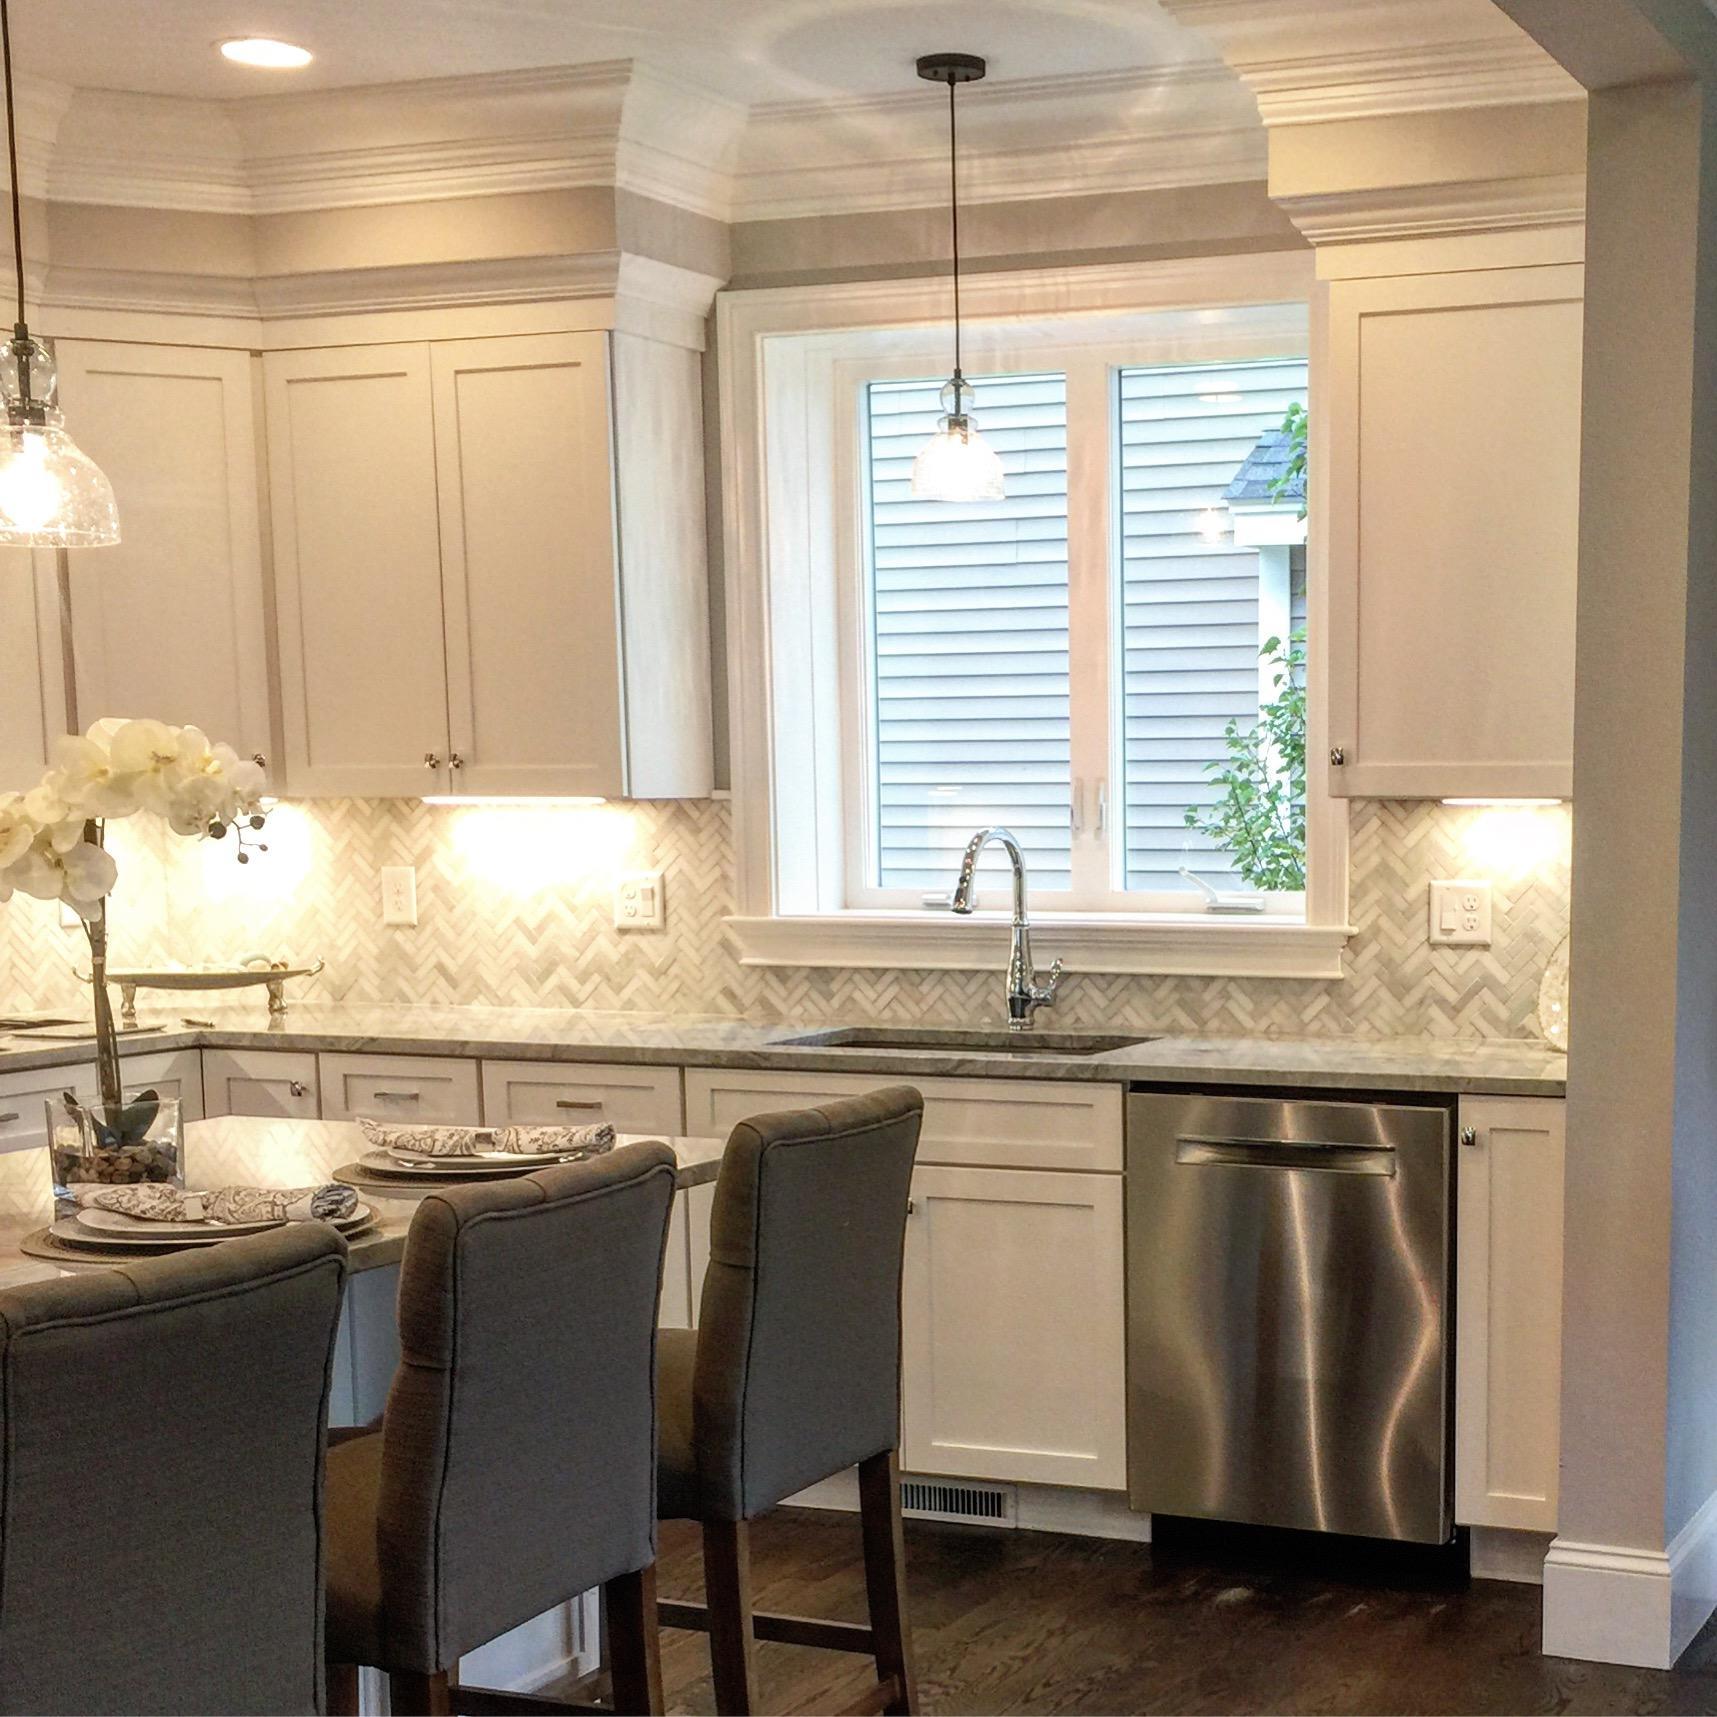 Creative Design Interiors Kitchen And Bath. Print. Share. 134 Mystic Ave